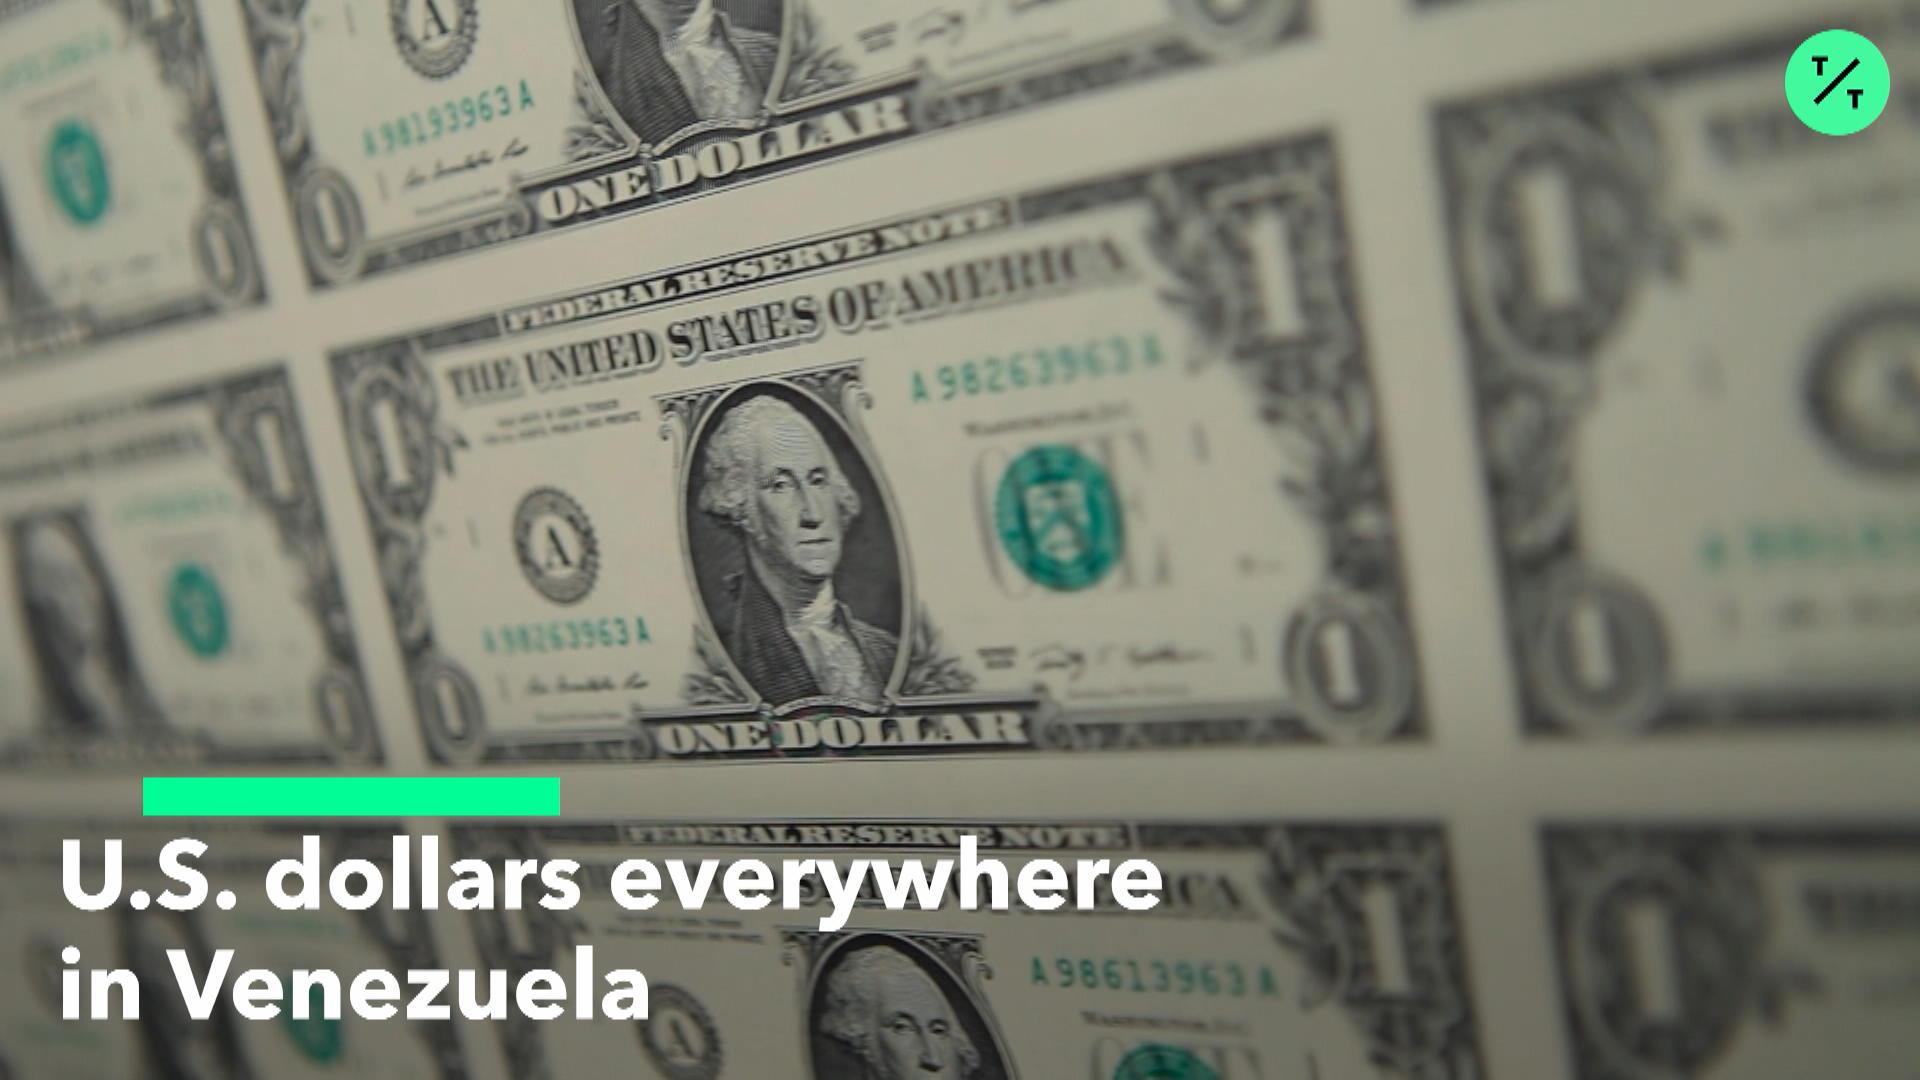 U.S. Dollars Everywhere in Venezuela